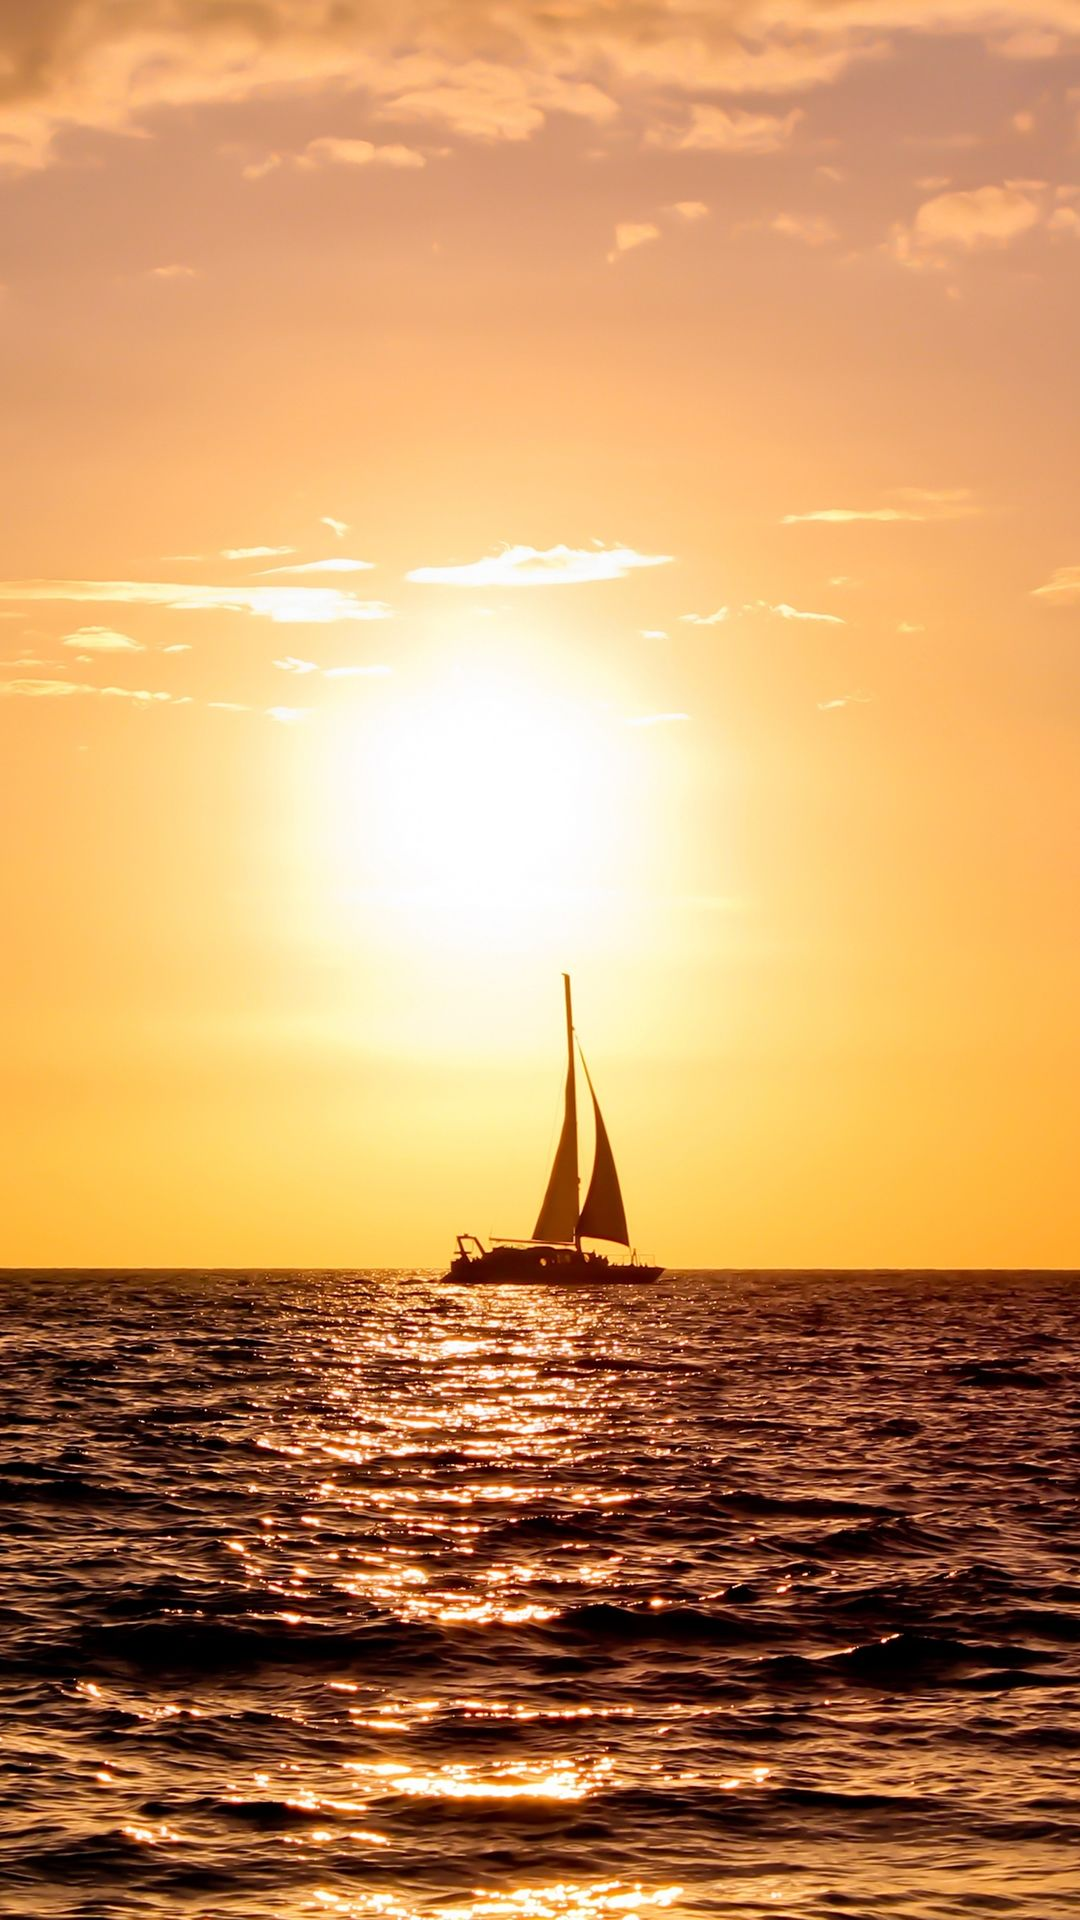 Ship On Sunset Sea Iphone 7 Wallpaper Iphone 8